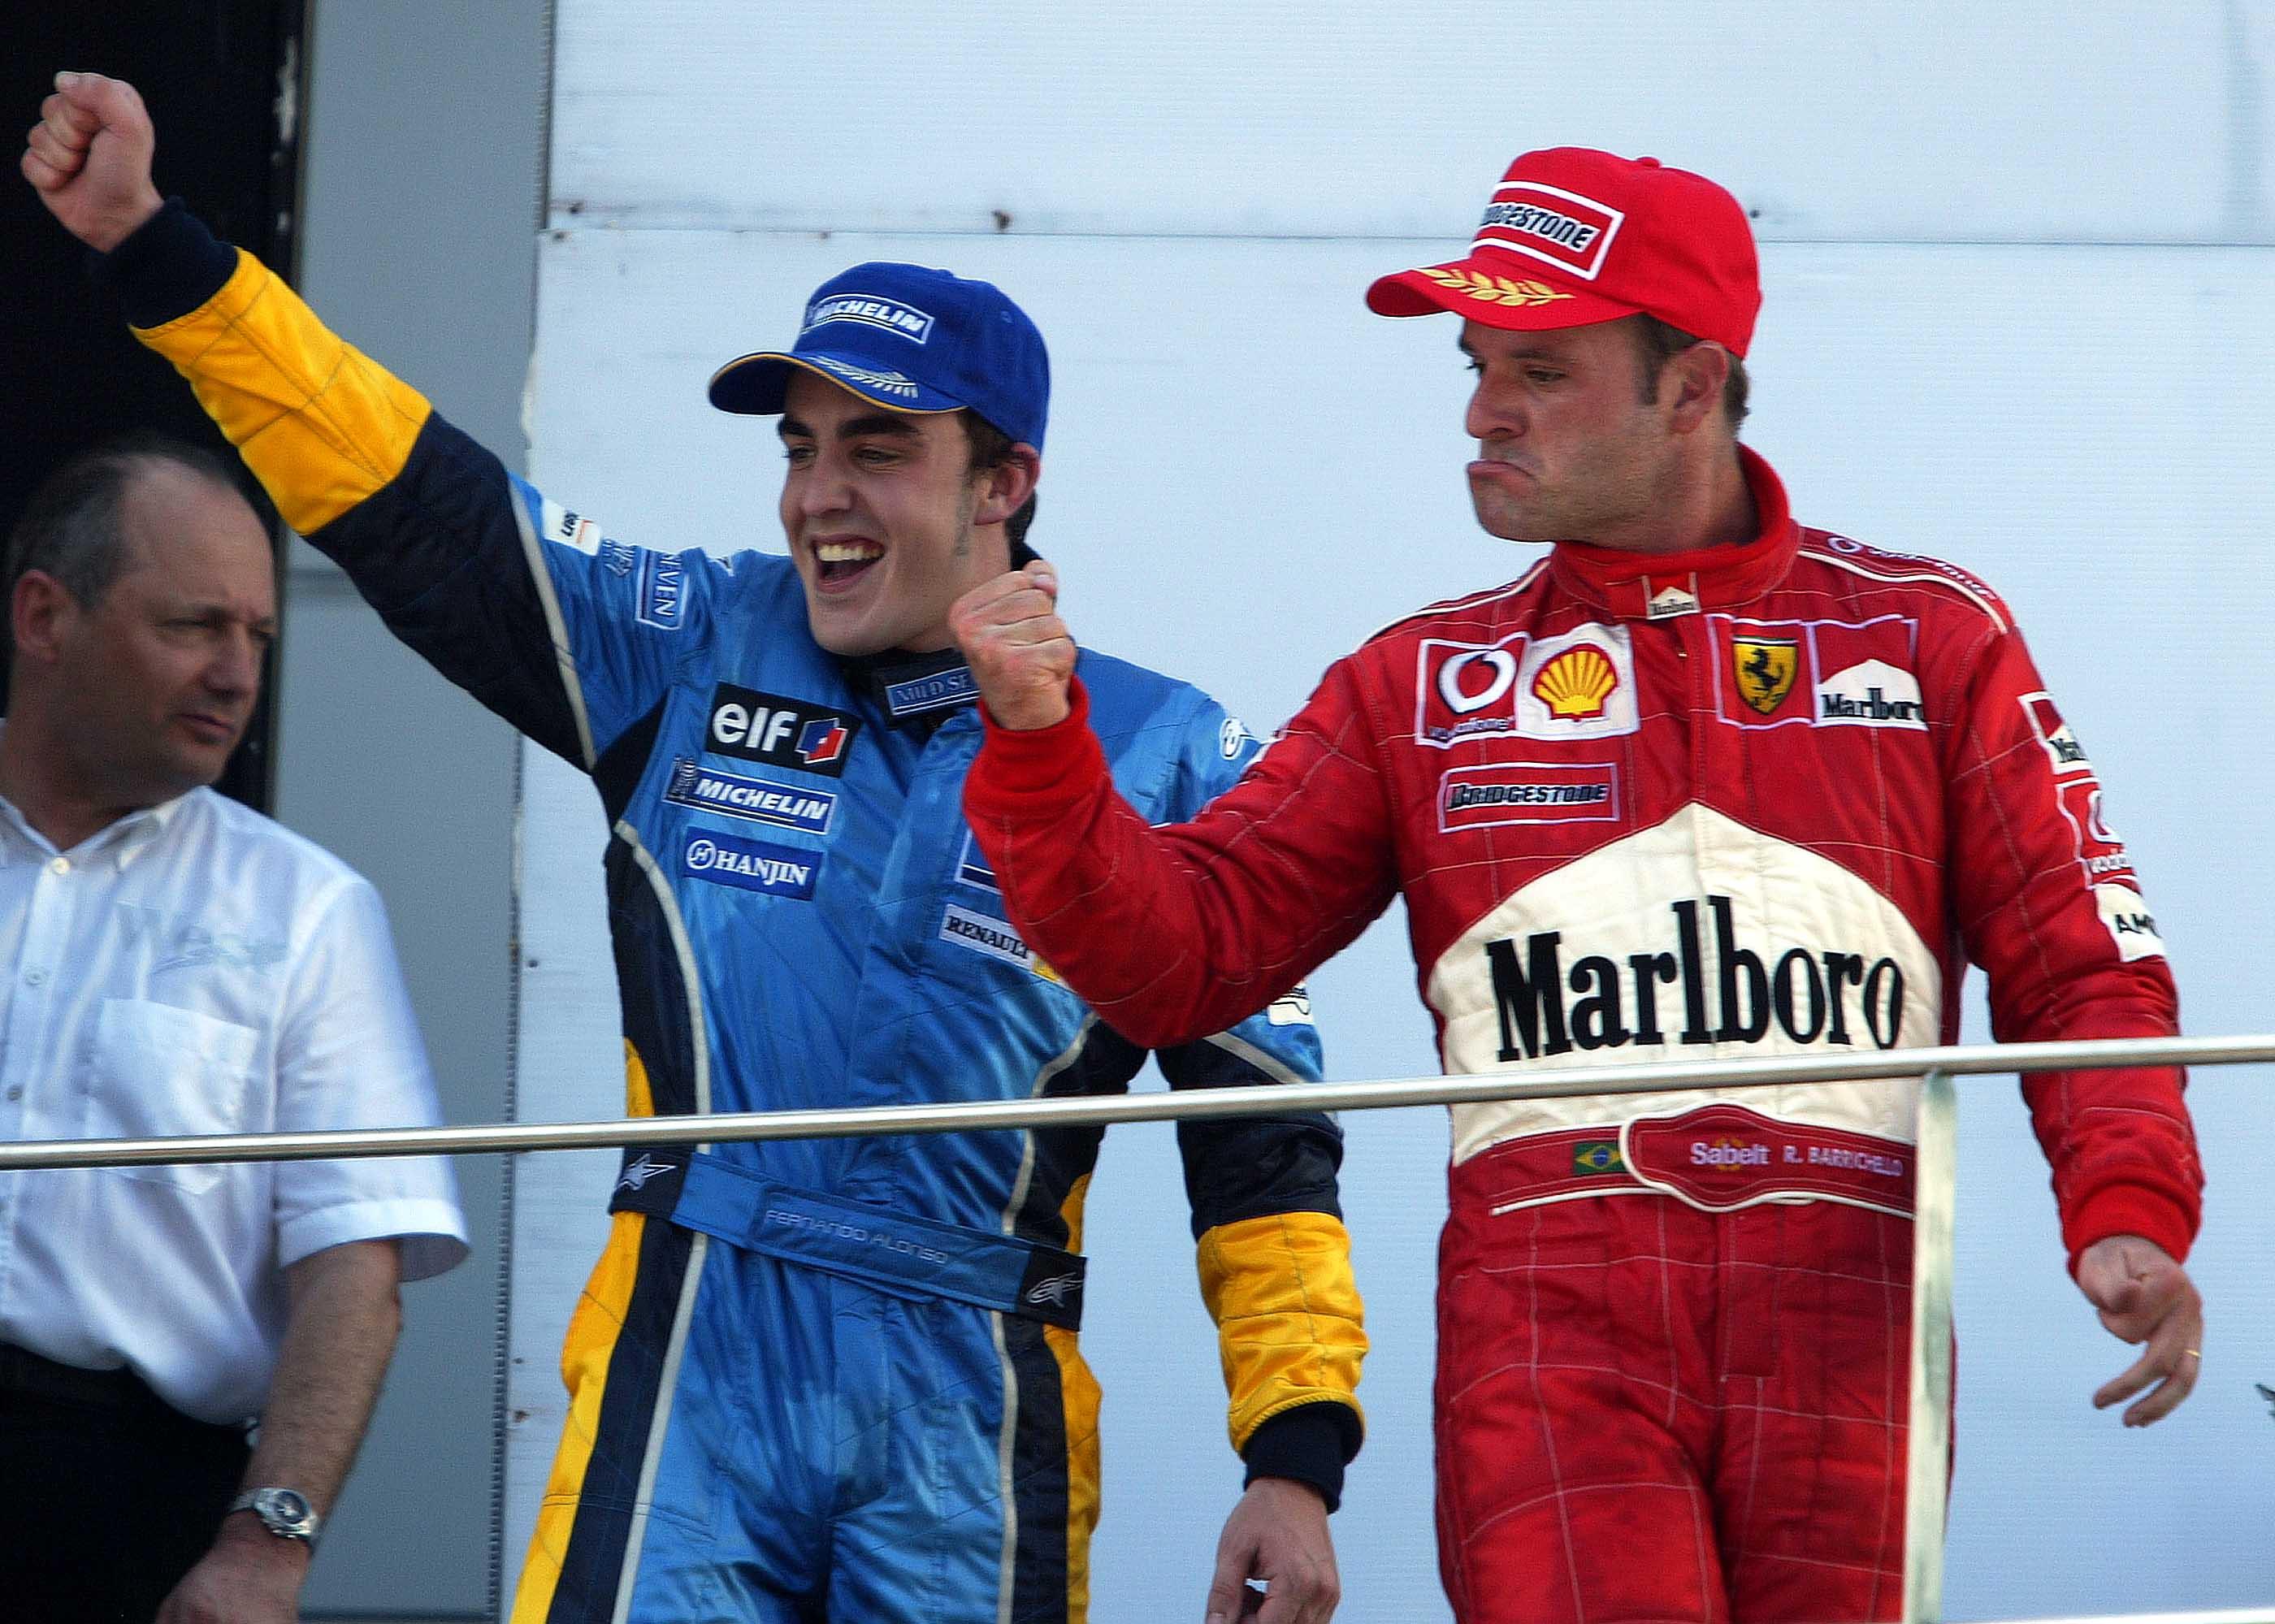 Fernando Alonso Rubens Barrichello Malaysian Grand Prix podium 2003